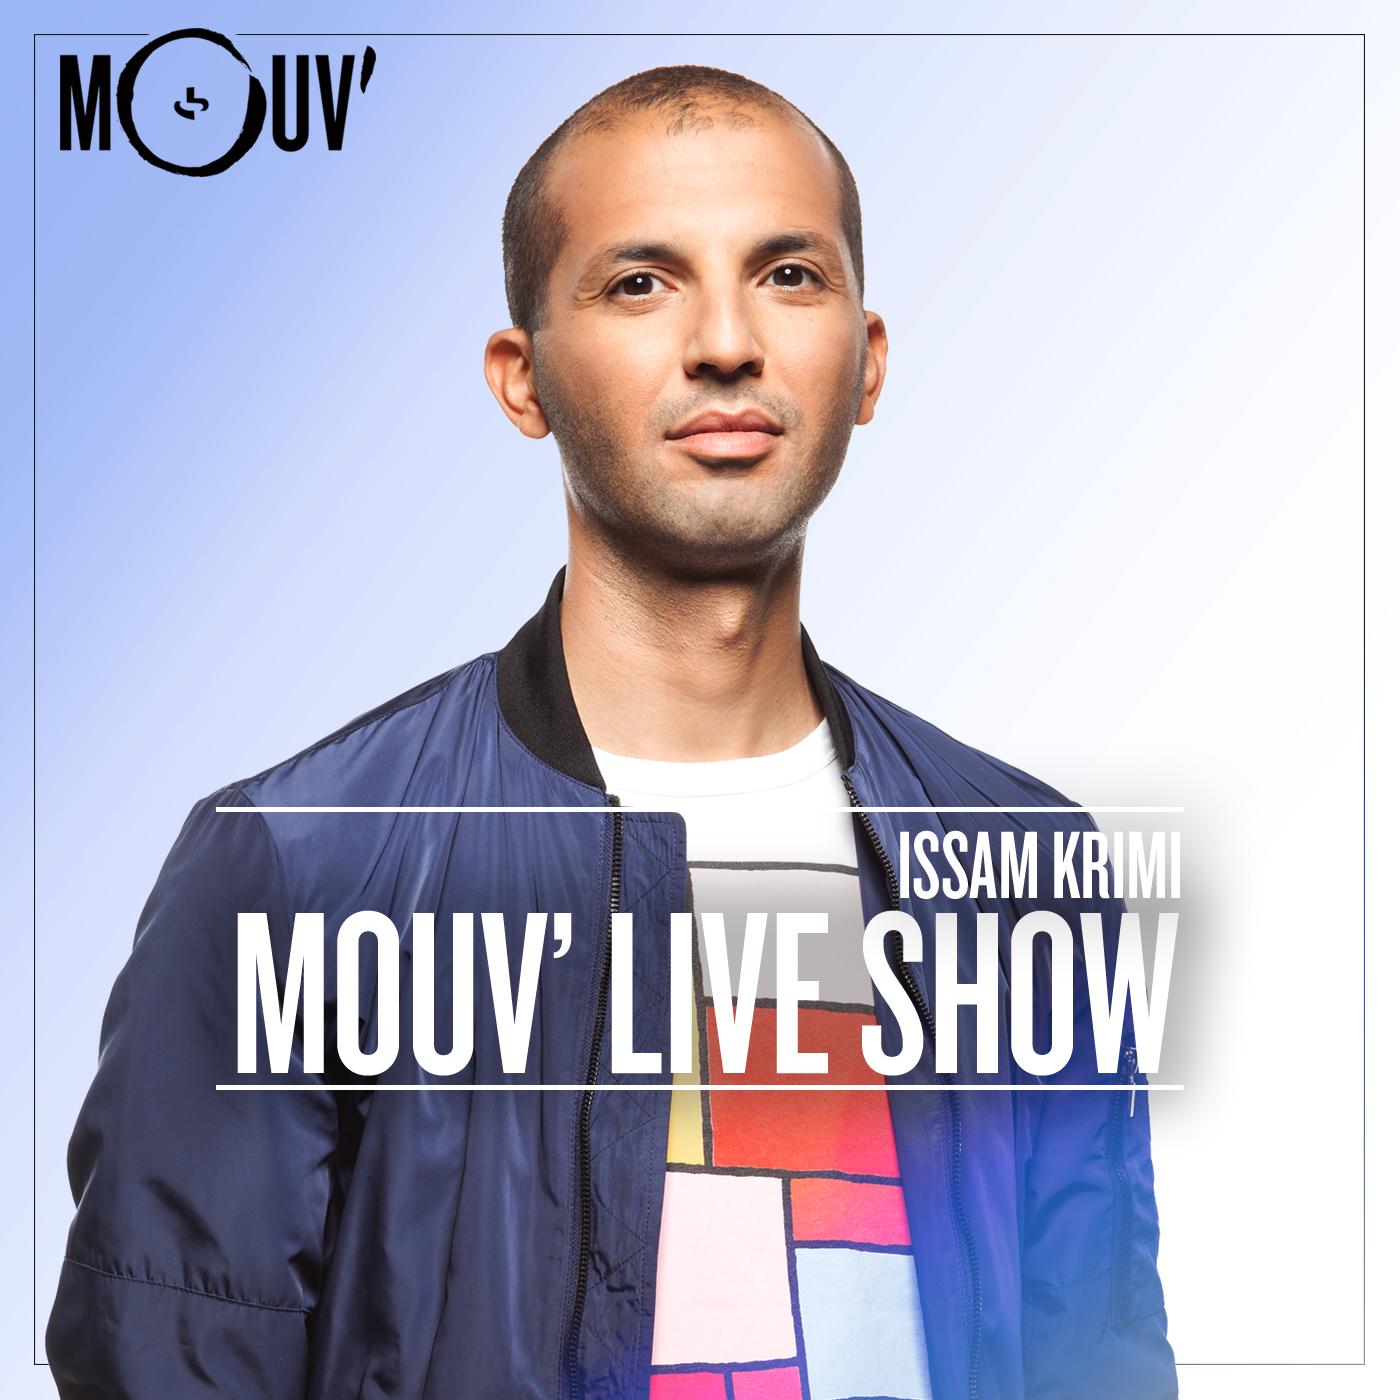 Mouv' Live Show